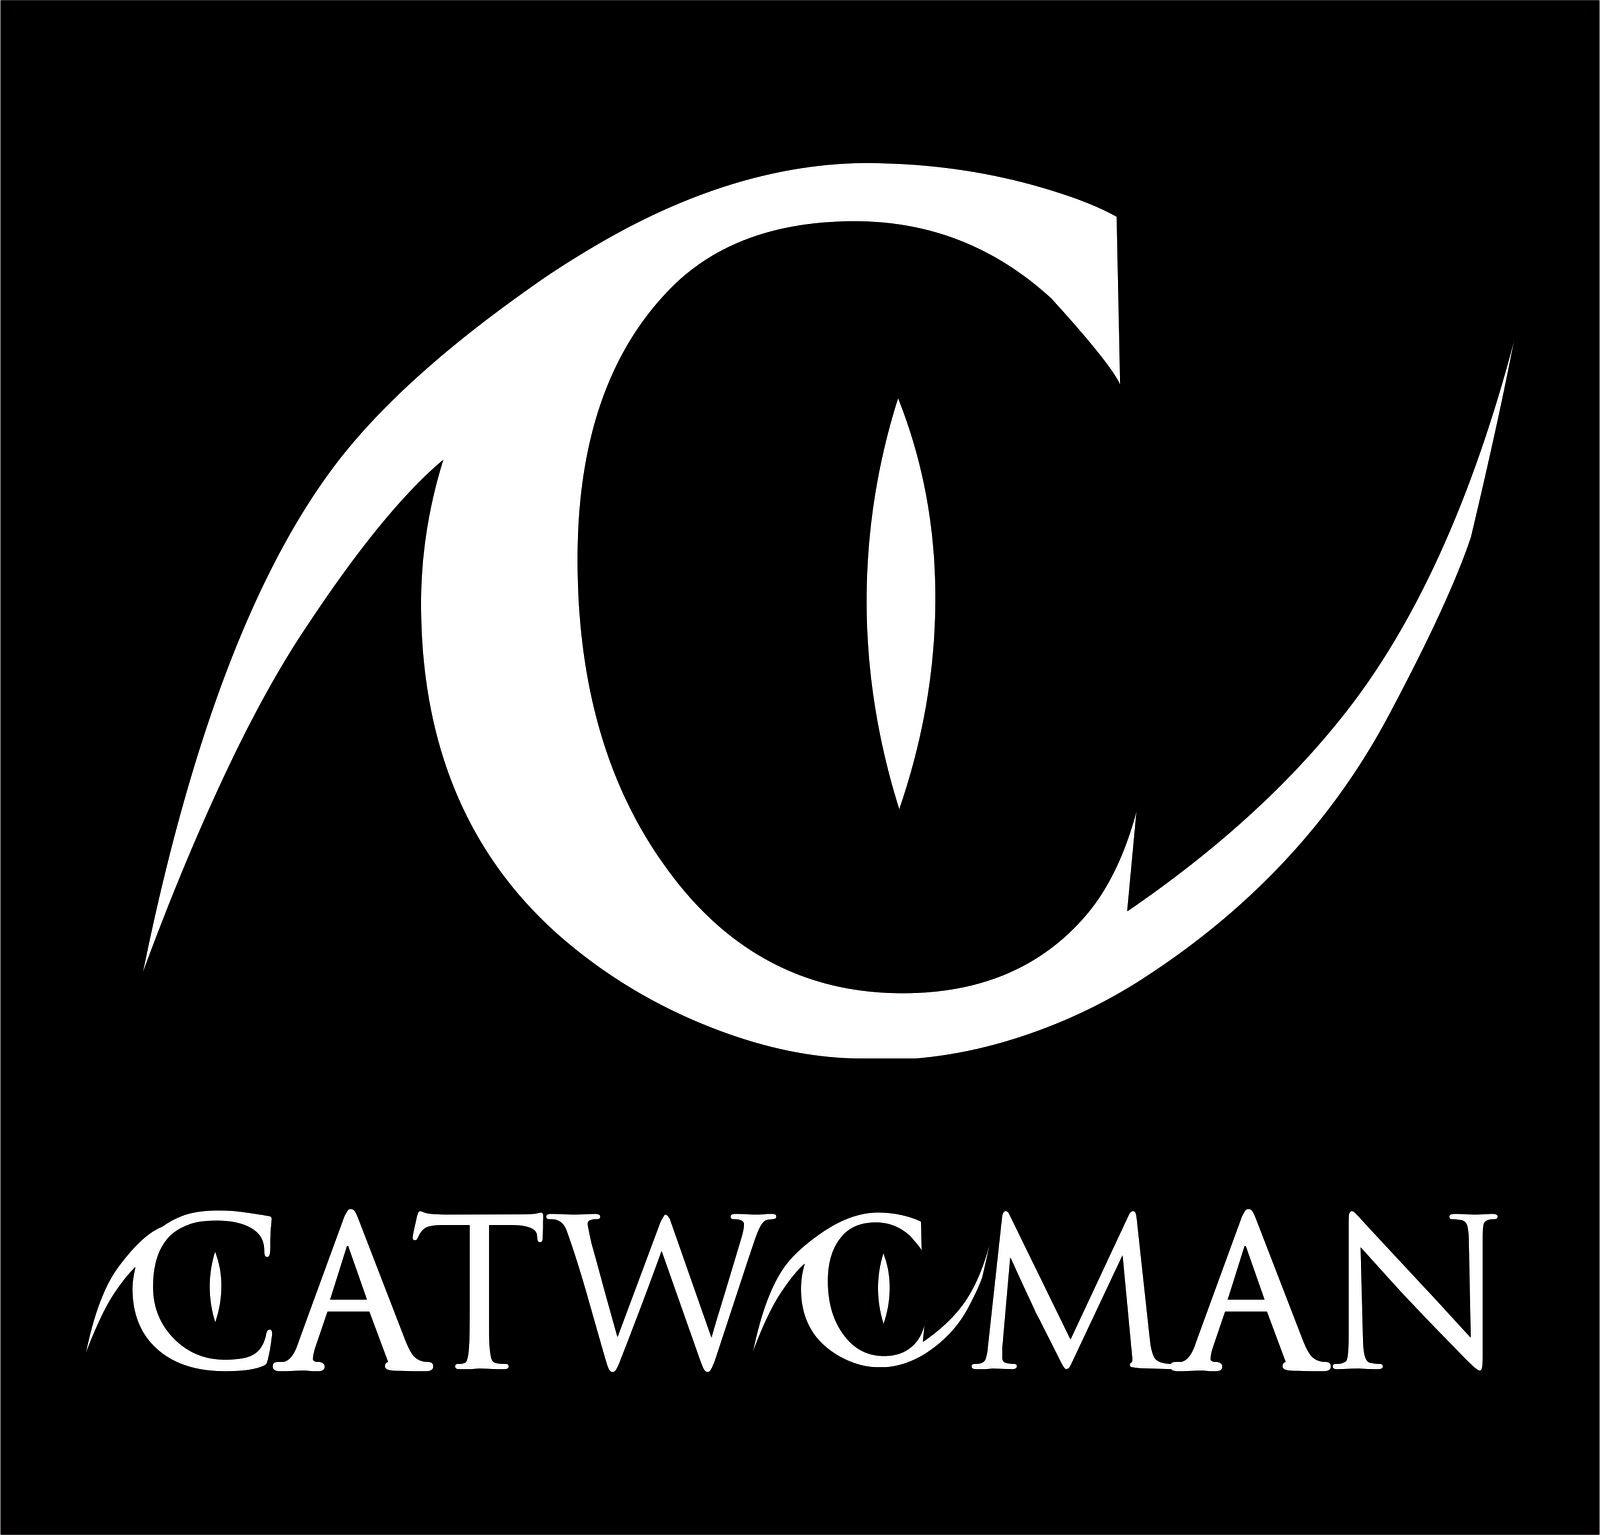 catwoman logo - Cerca con Google | Catwoman | Pinterest